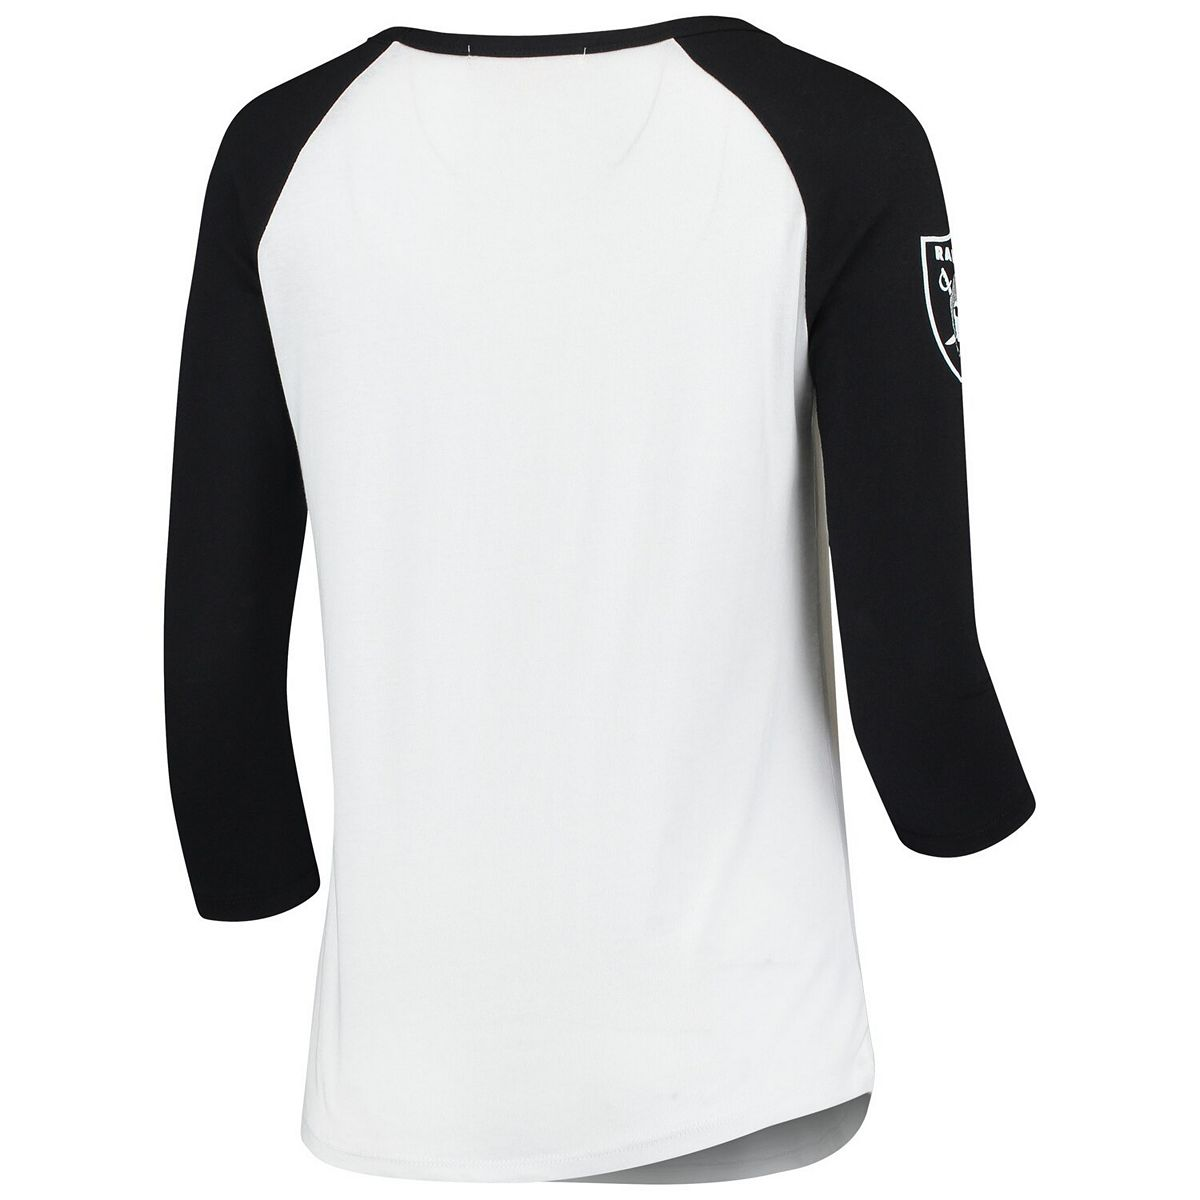 Women's Junk Food White/Black Oakland Raiders Retro Script Raglan 3/4-Sleeve T-Shirt fzybV